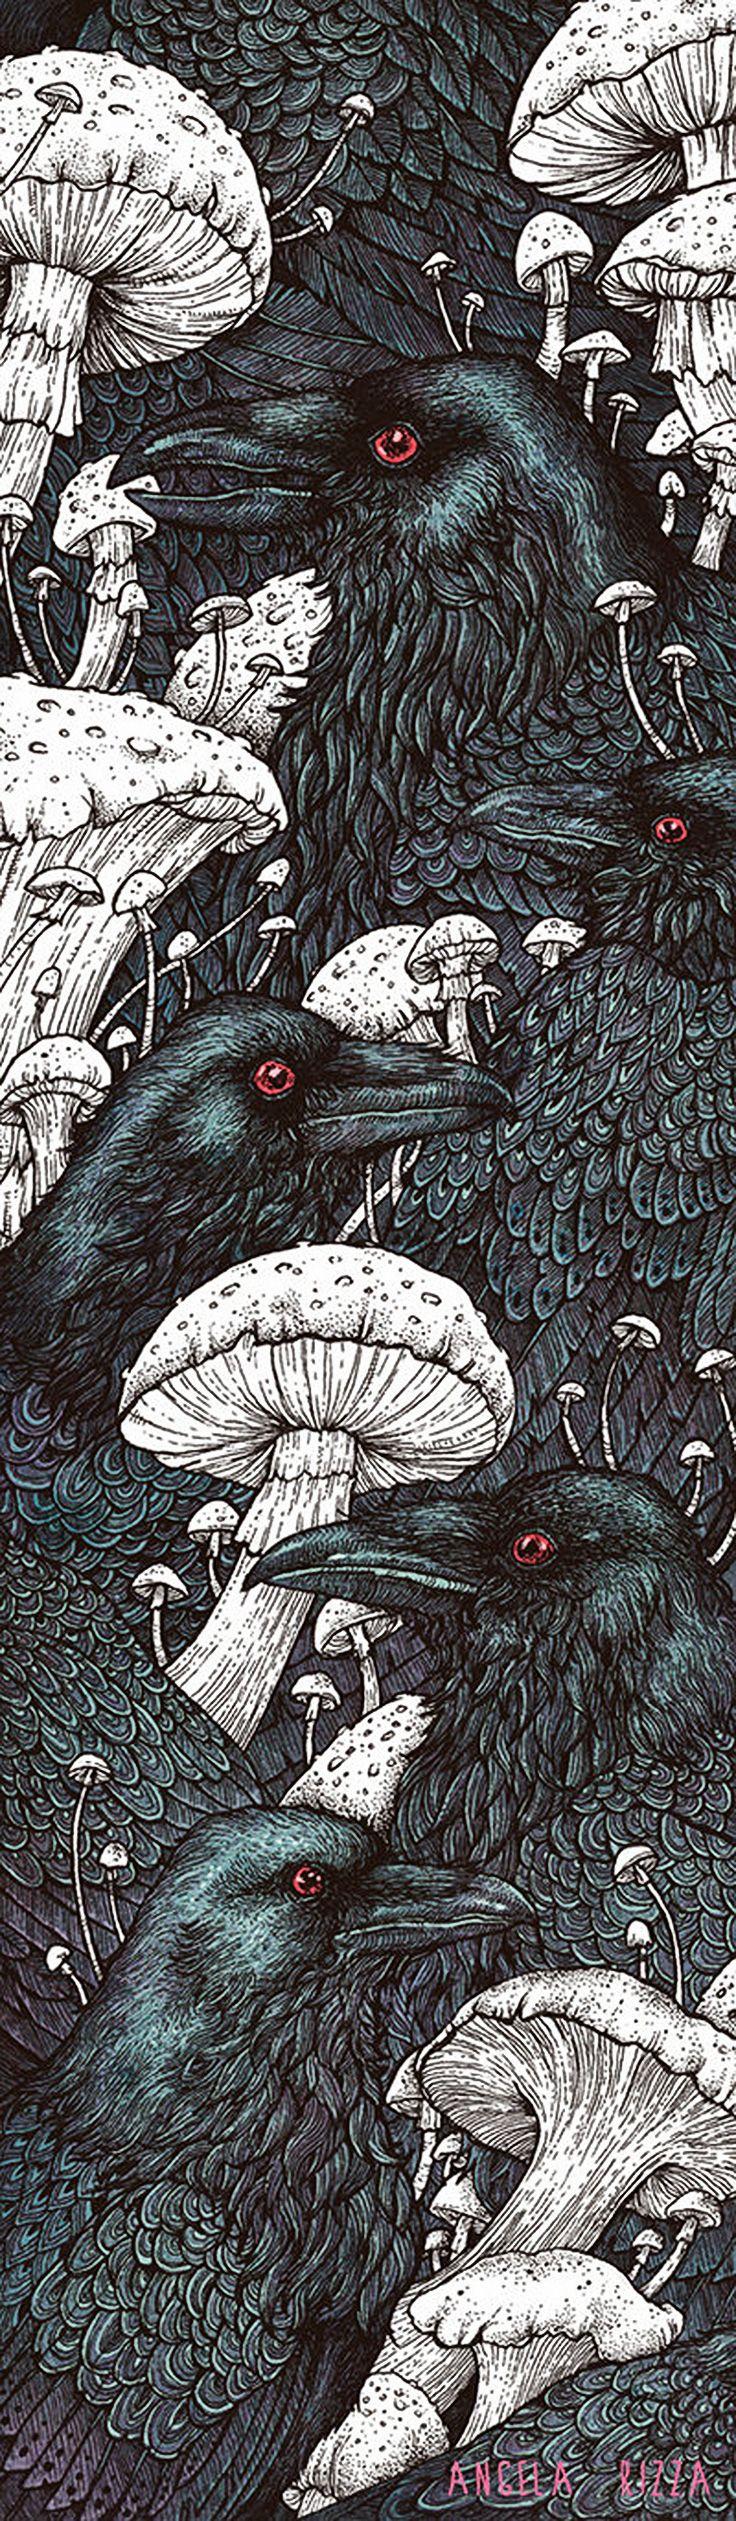 """Decay"" - Angela Rizza {contemporary art animals crows #ravens birds mushrooms illustration} angelarizza.deviantart.com"